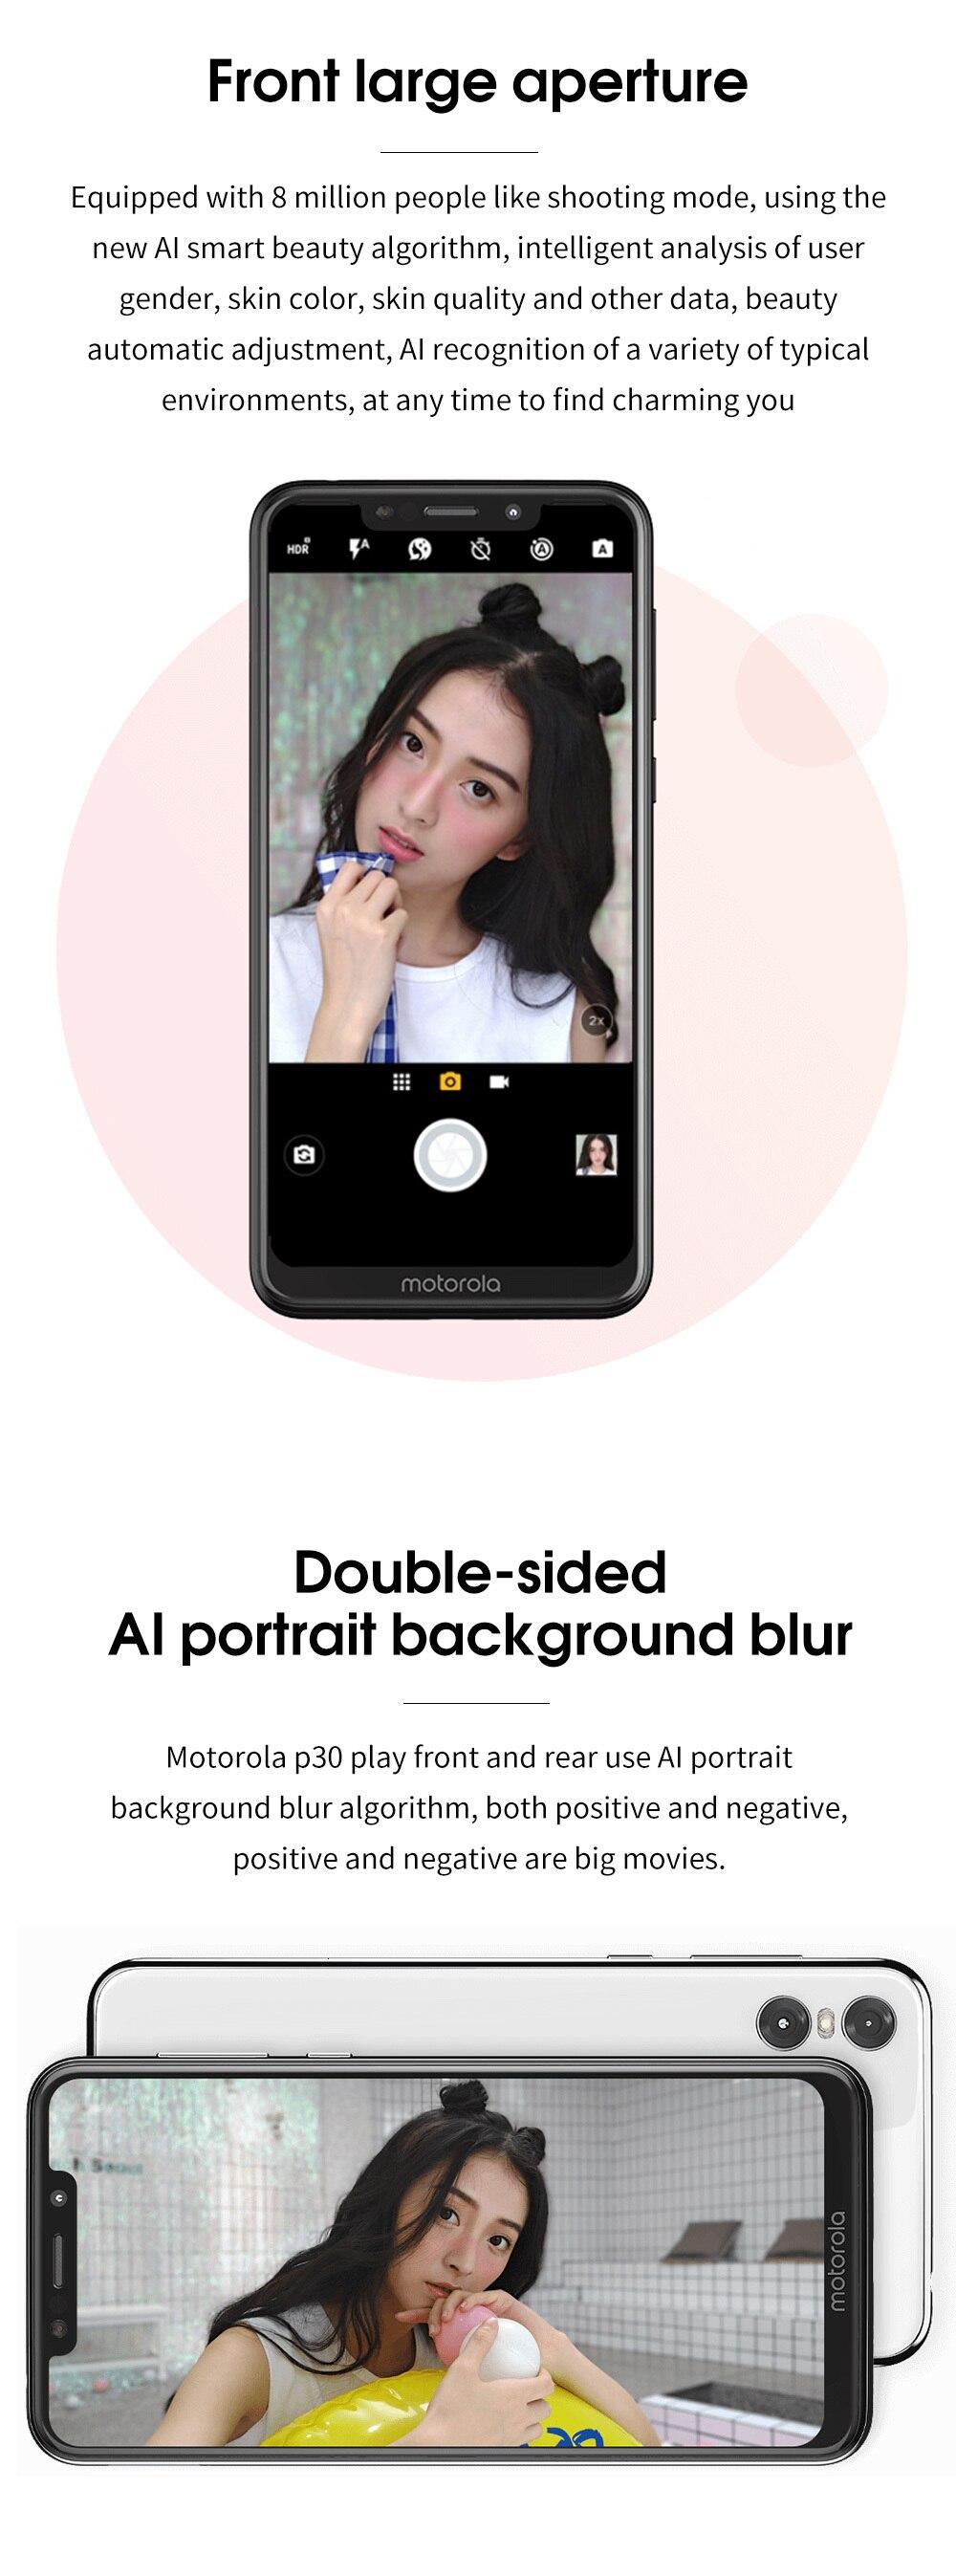 H94bc8e26e0c1460e984d7669787b4644m Moto One Mobile Phone 4GB 64GB AI Camera Smartphone 2.5D Double-sided Glass Body Octa Core Phone Support Face Fingerprint Unlock